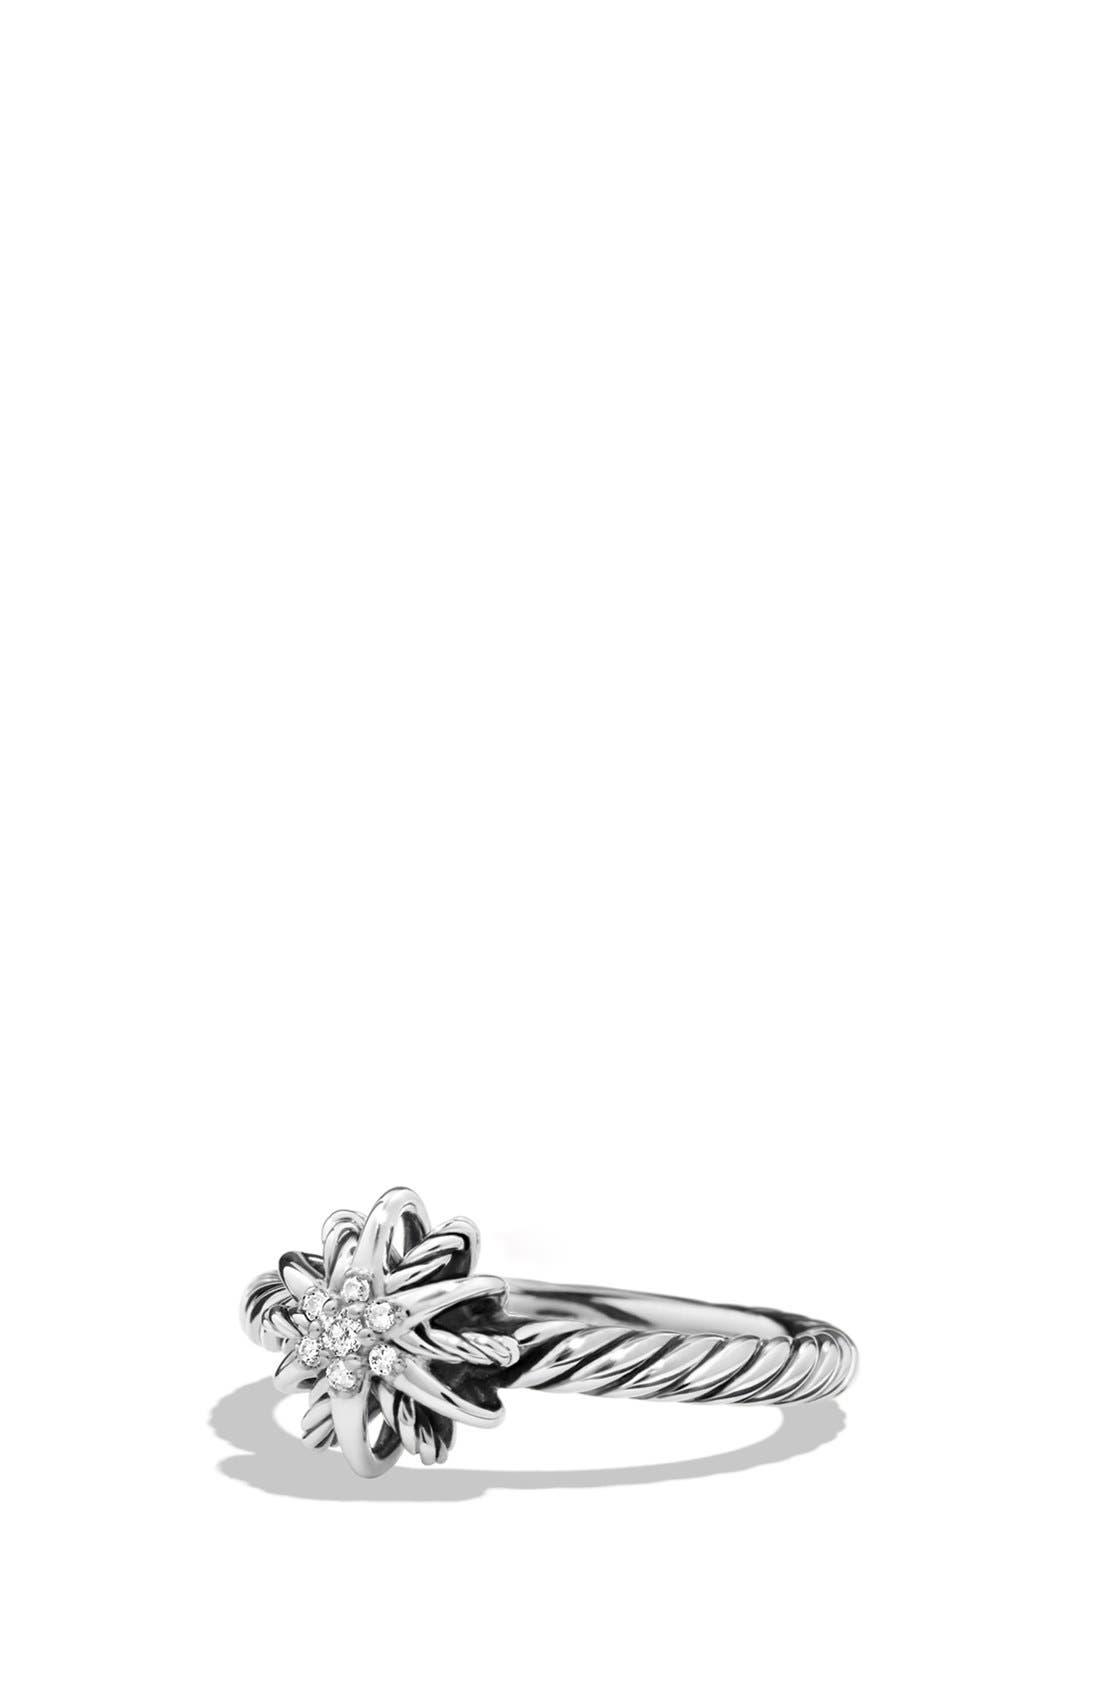 David Yurman'Starburst' Ring with Diamonds